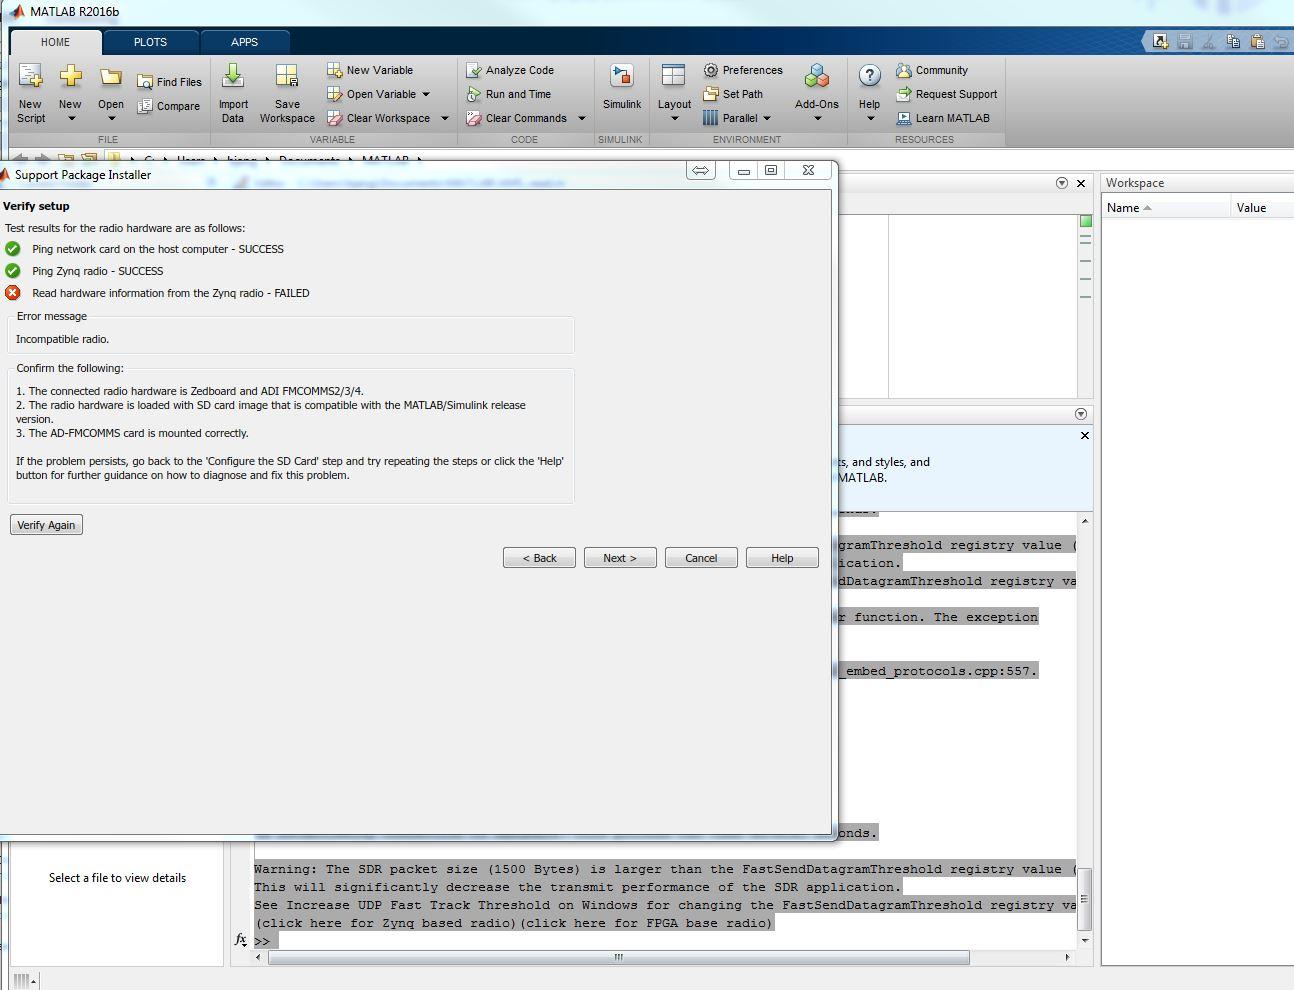 MAtlab setup in Zed+FMCOMMS2 - Q&A - FPGA Reference Designs